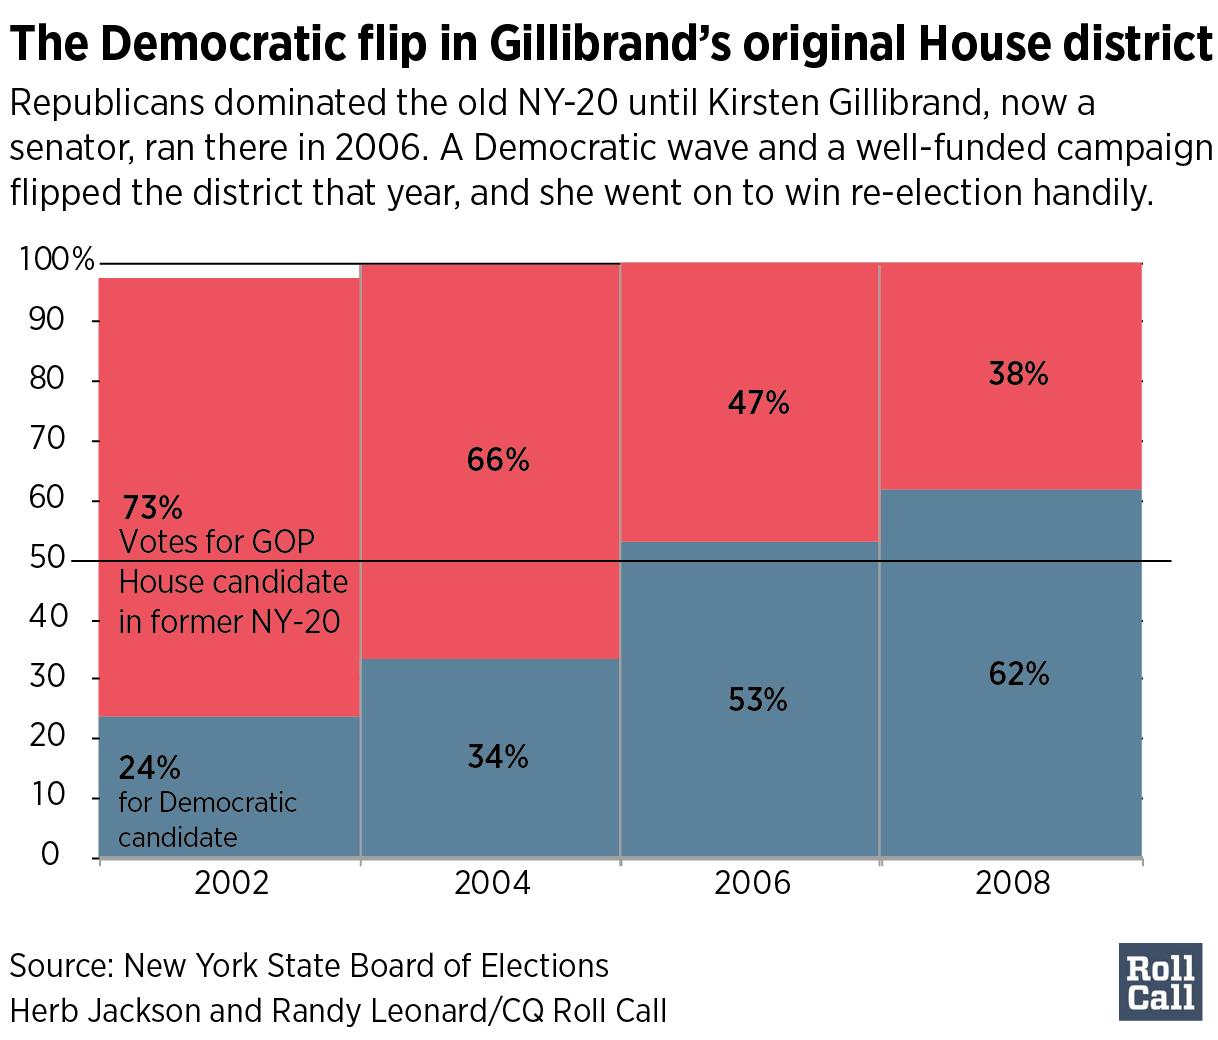 GillibrandElection